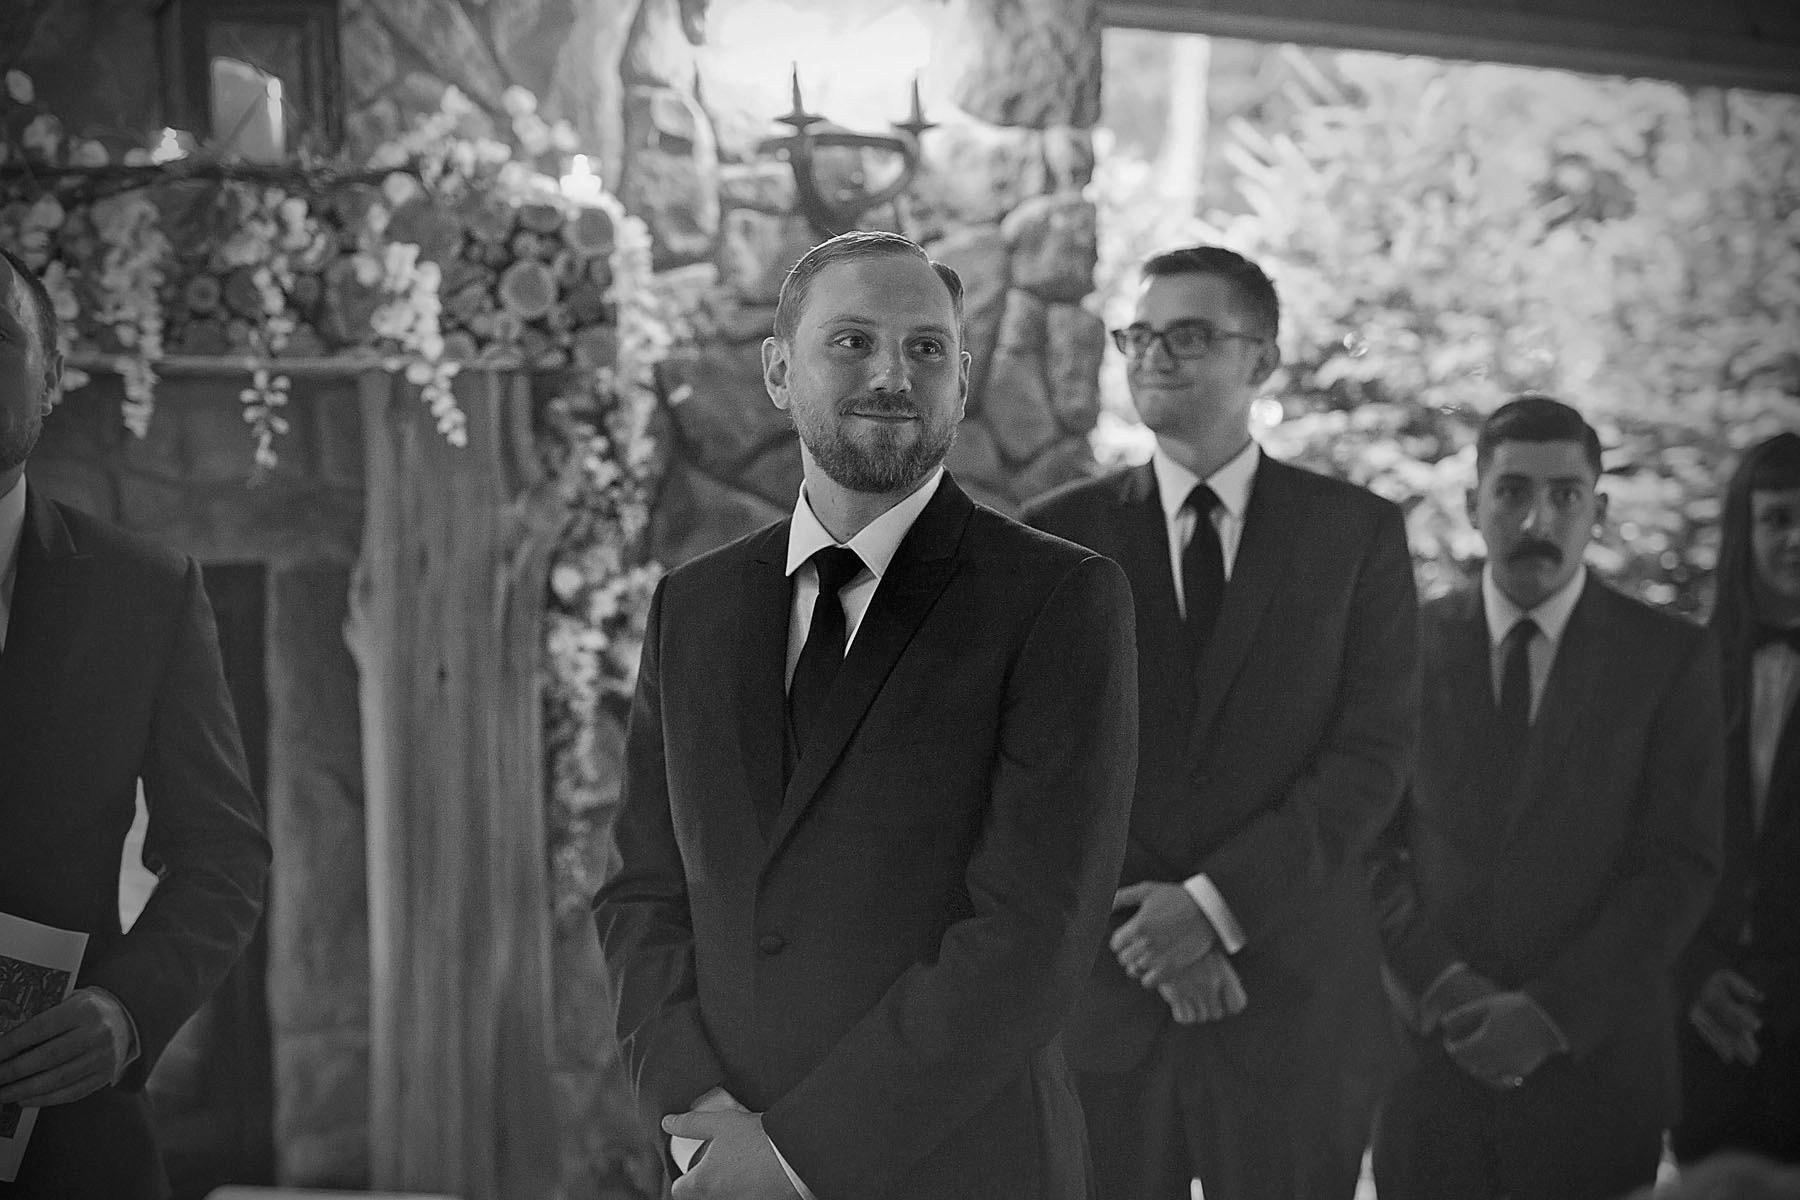 Bucks_County_wedding_photographer_Stroudsmoor_country_inn_wedding_Philadelphia_wedding_photographer_11_groom_awaits_his_bride_stroudsmoor_country_inn.JPG